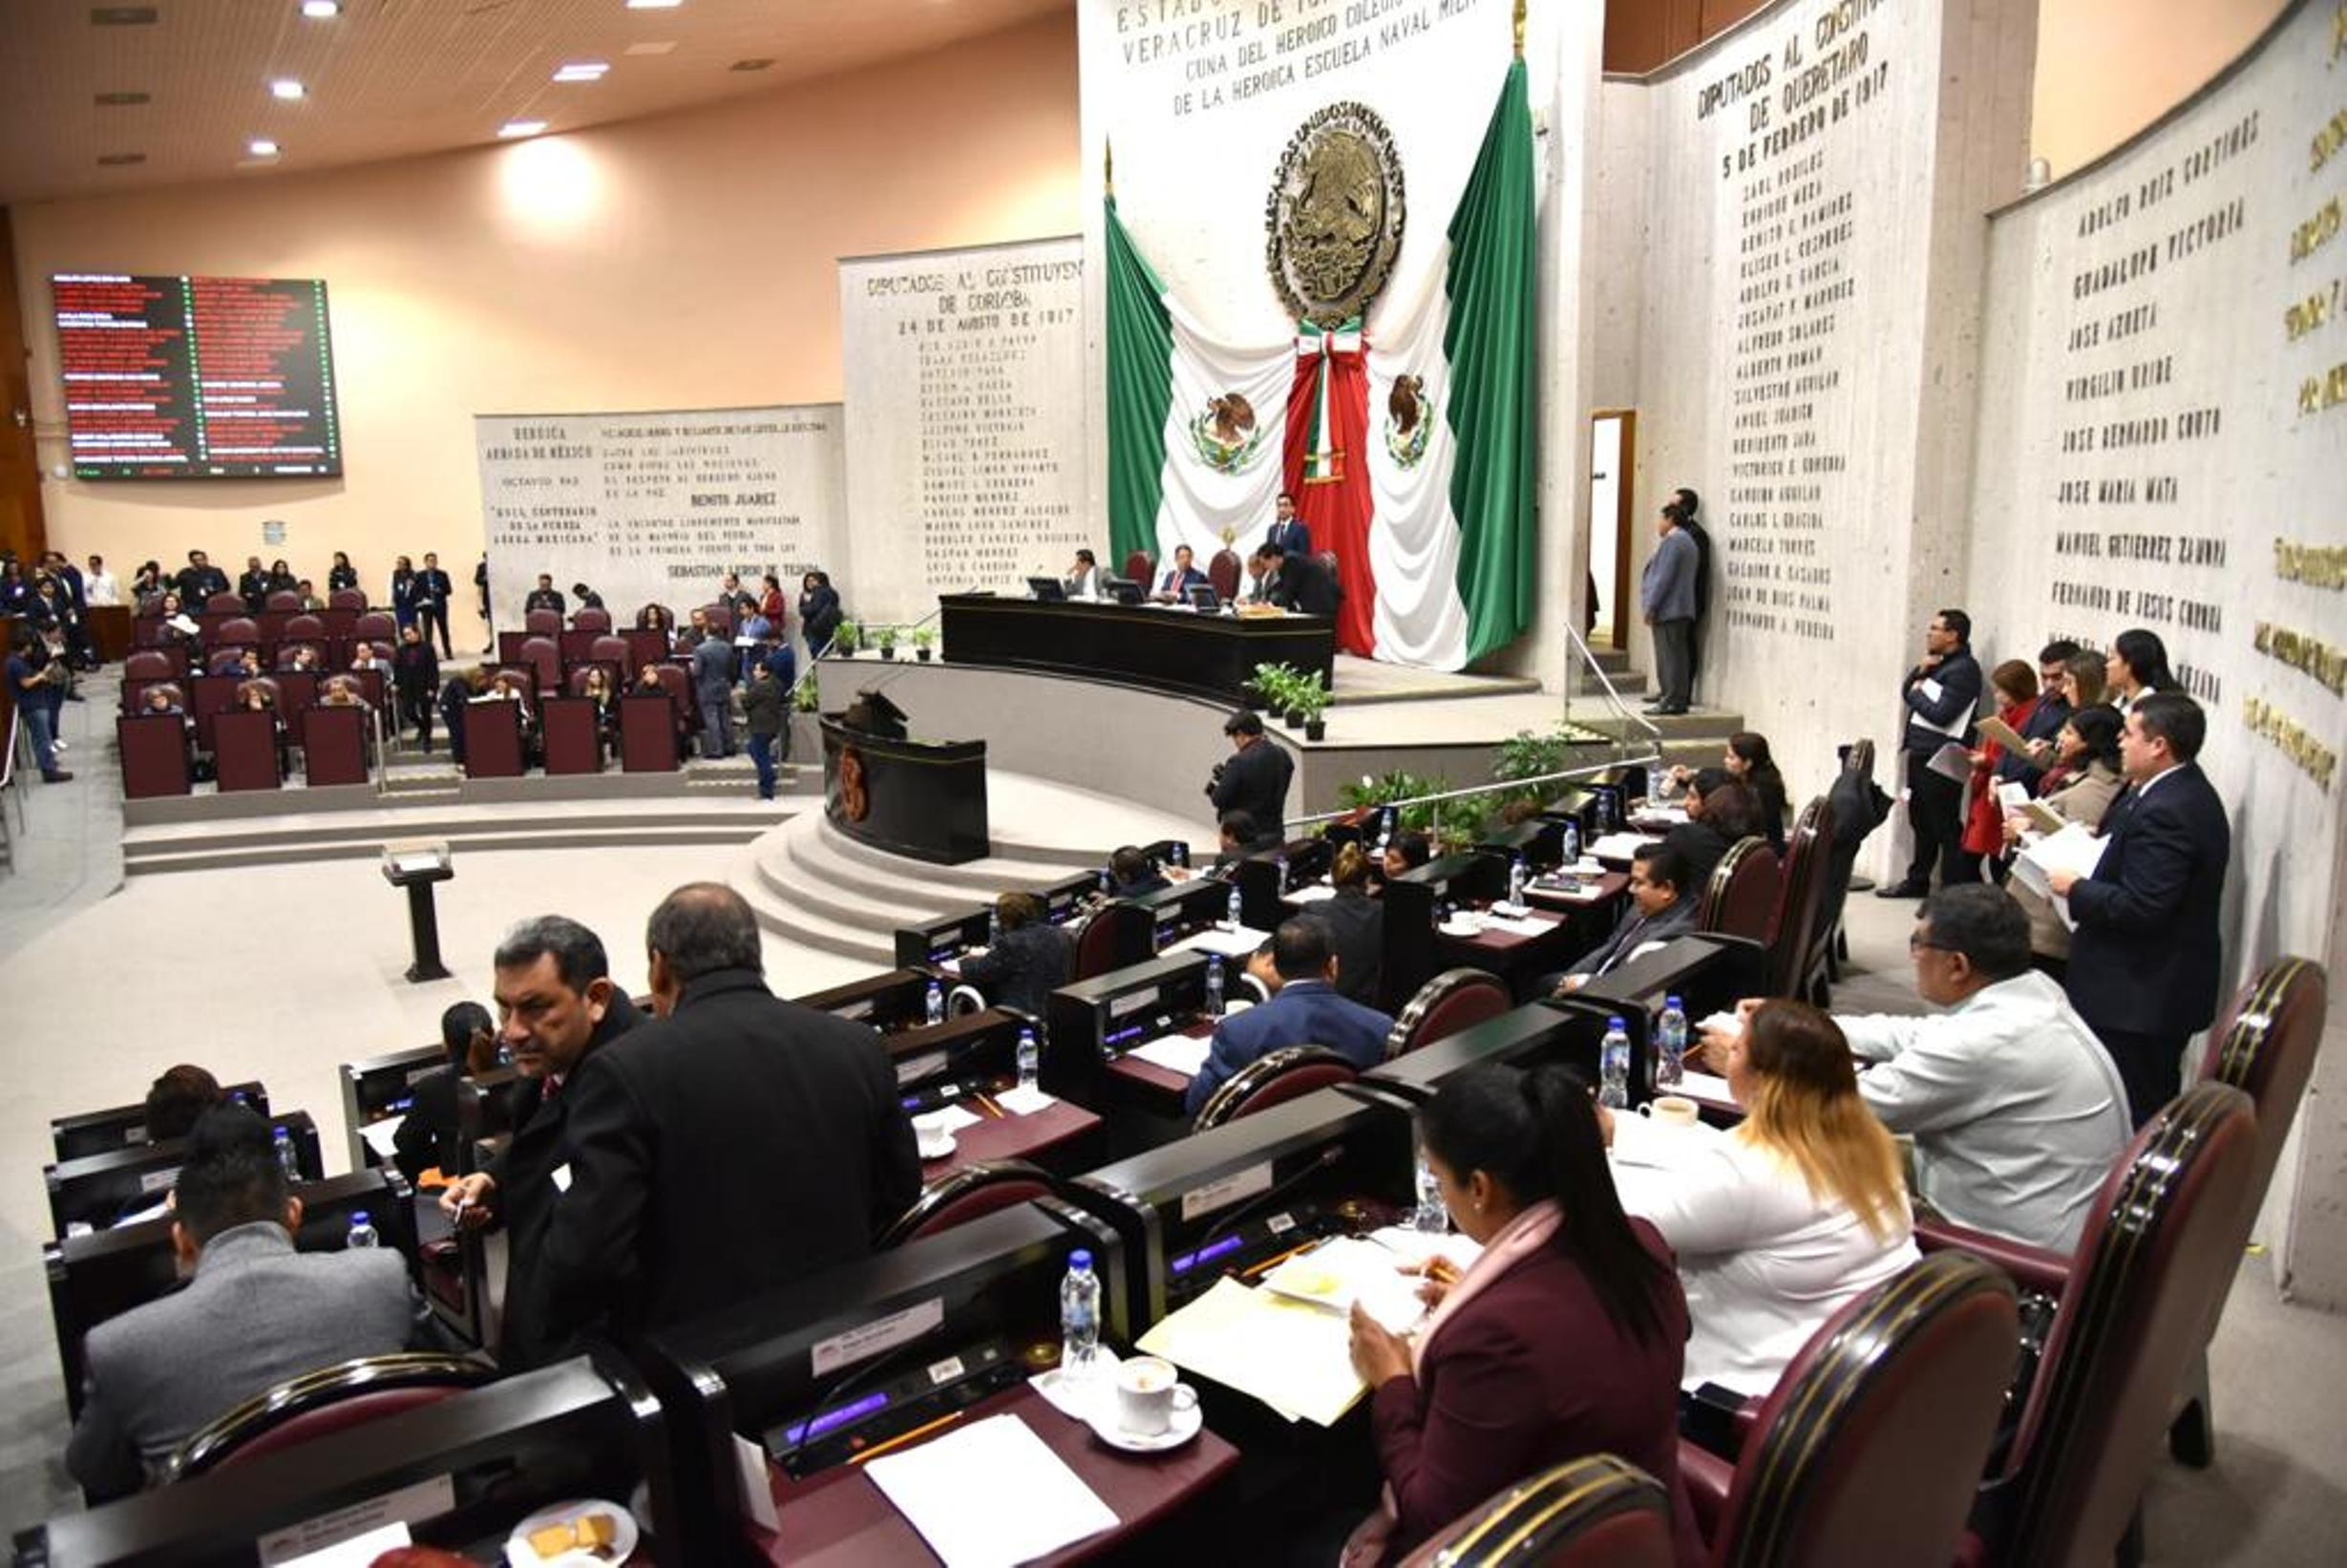 Votación para elegir magistrados seguirá pendiente por falta de consenso